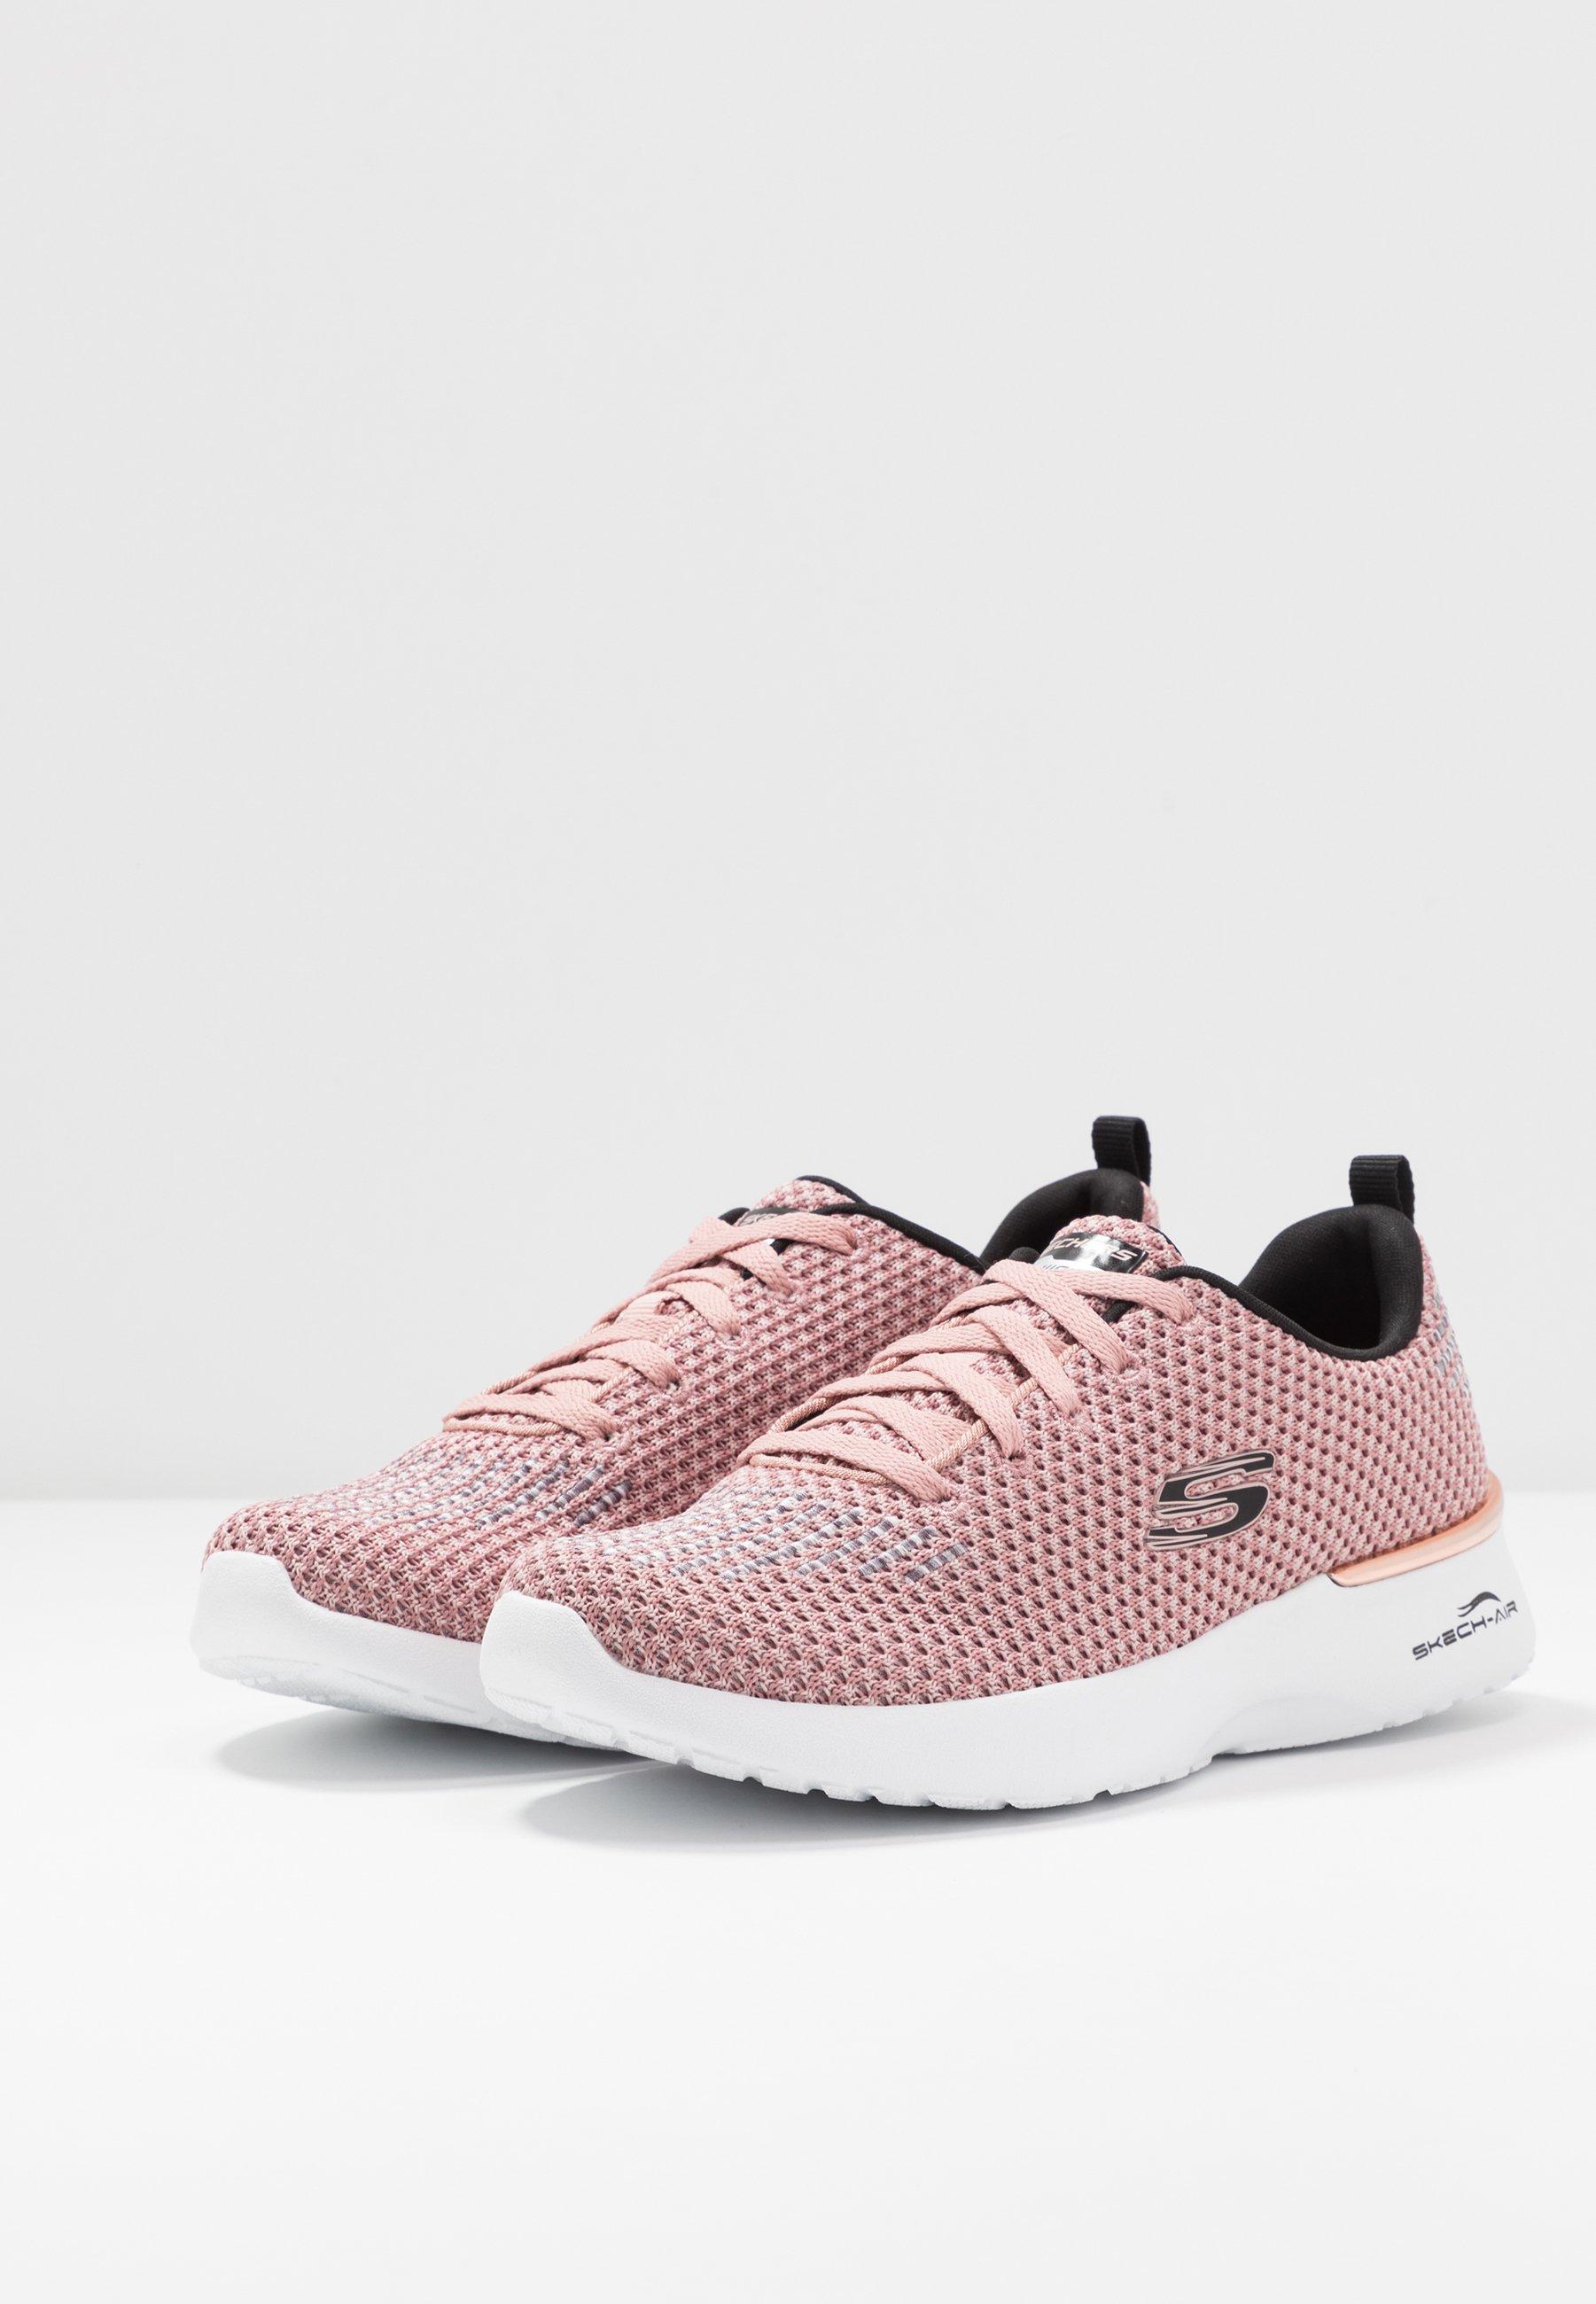 Skechers Sport SKECHAIR DYNAMIGHT Sneaker low rose gray/white/rosa